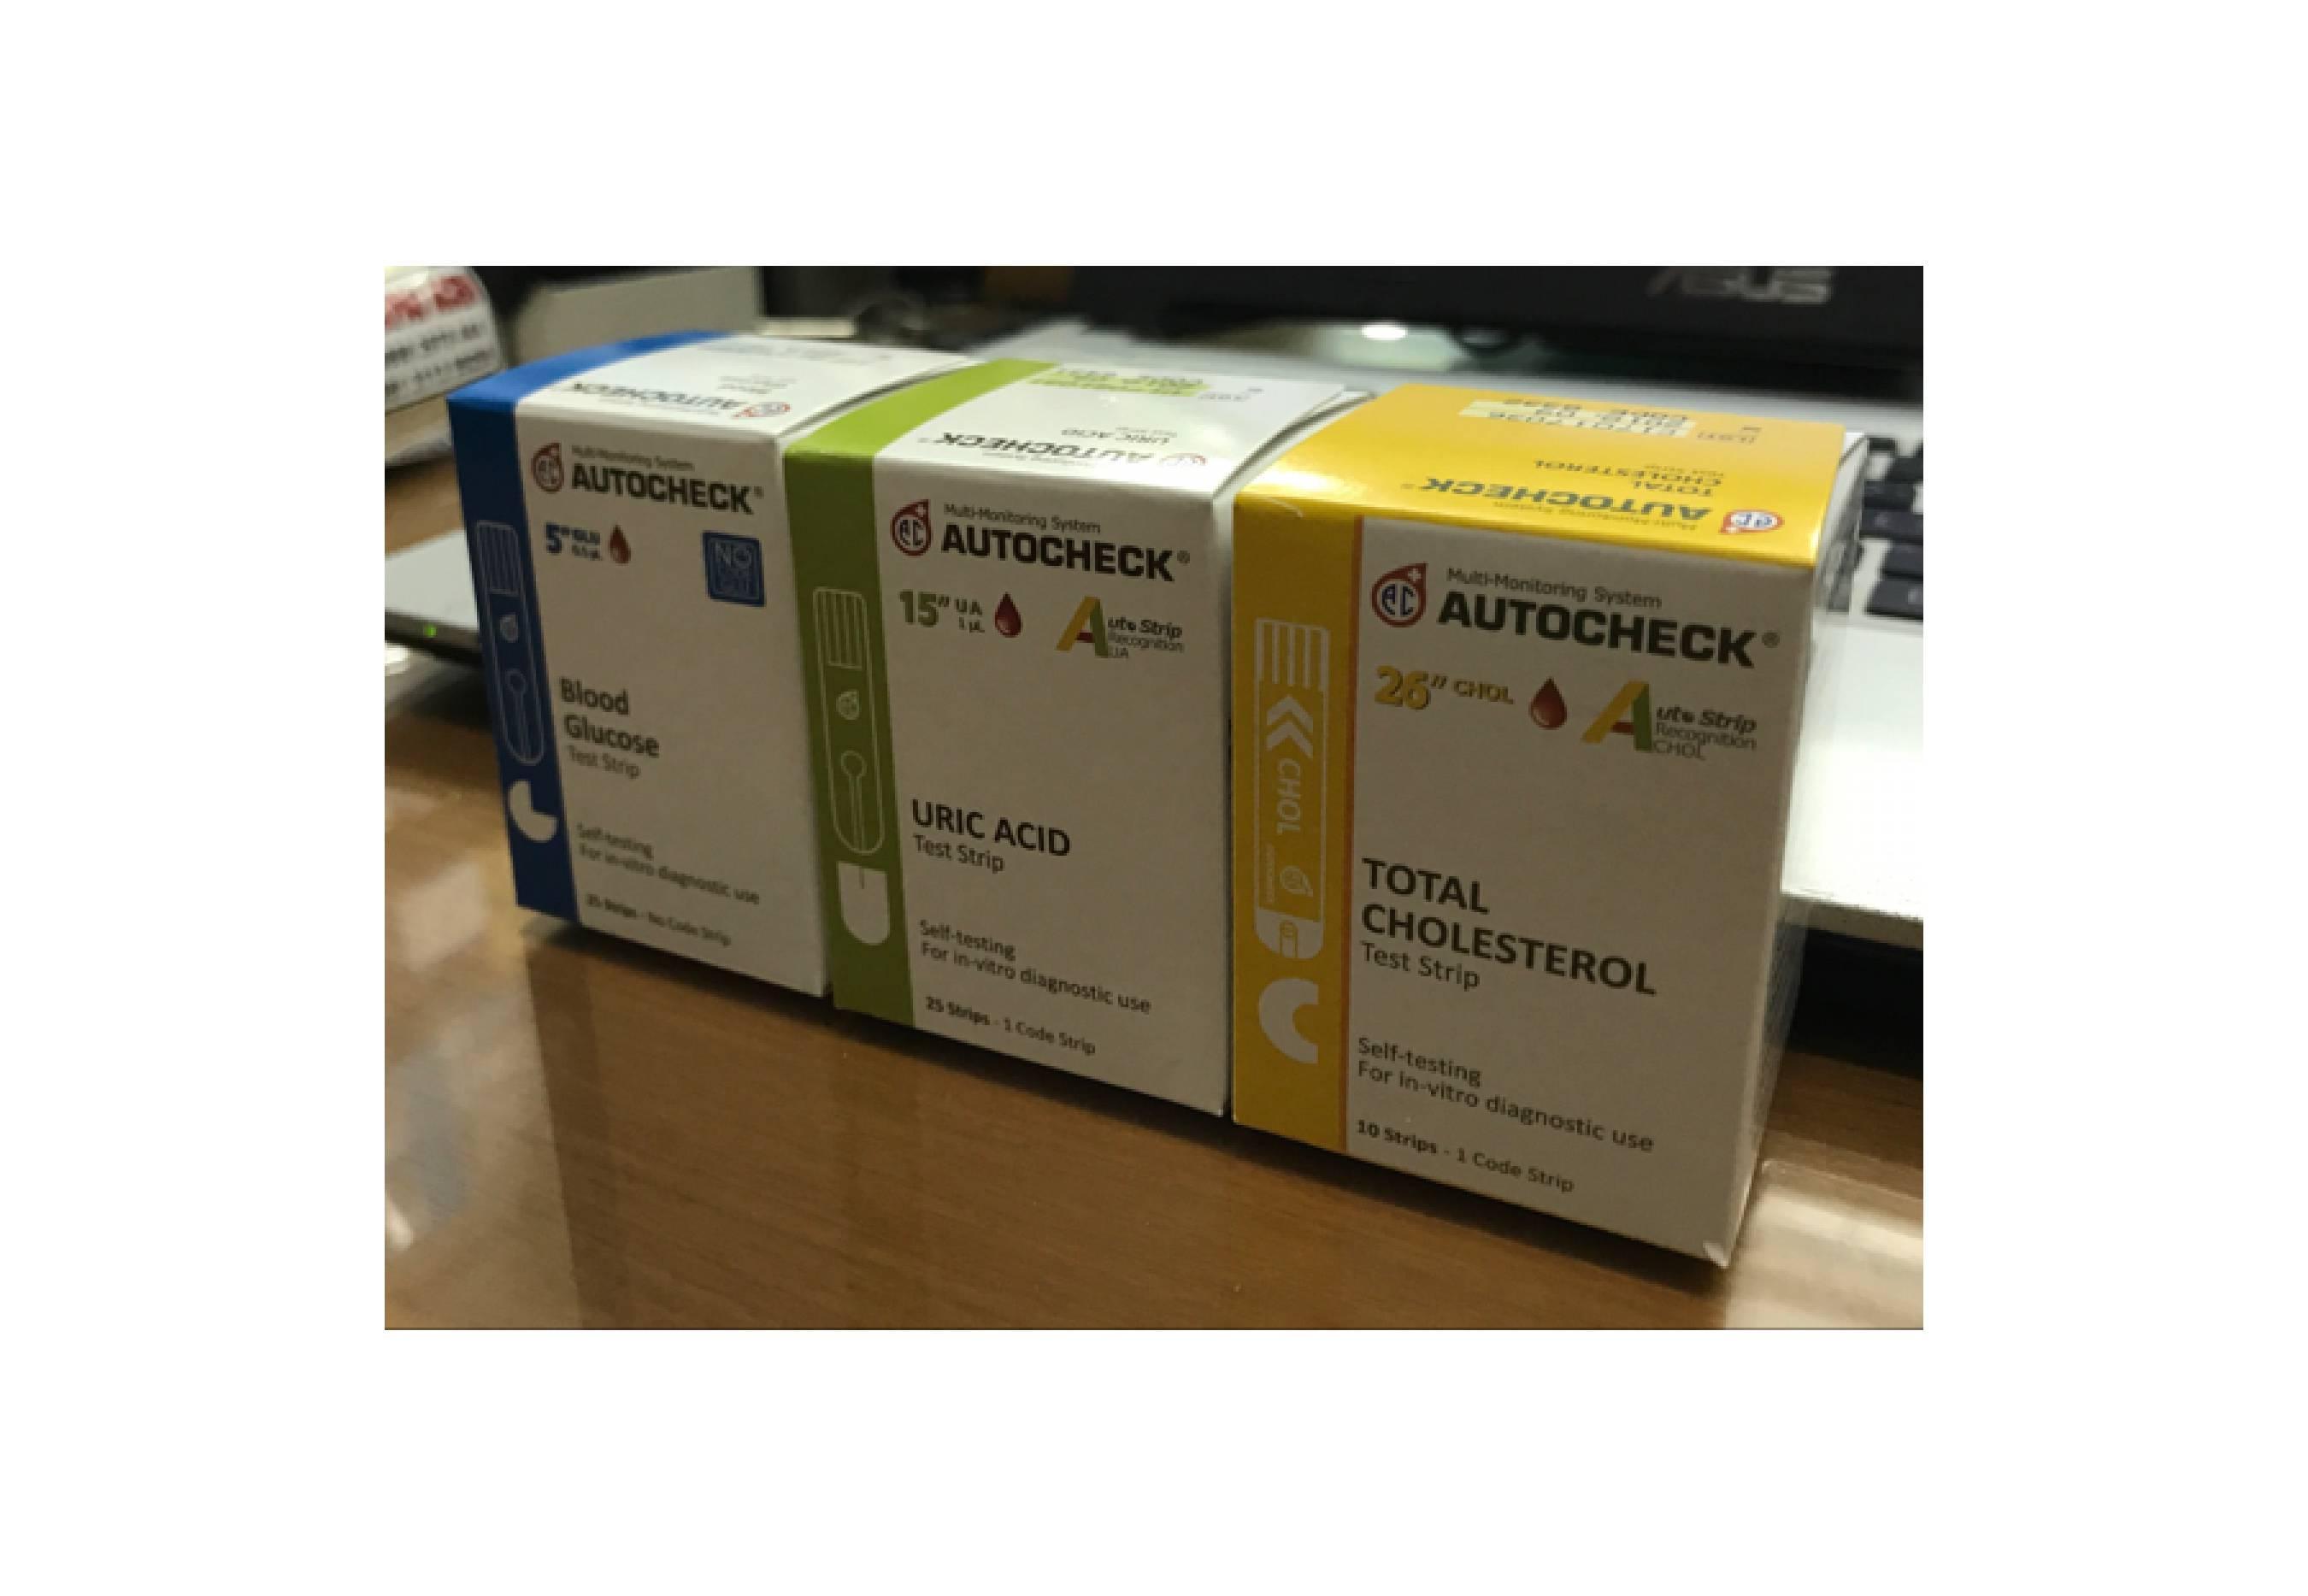 Buy Sell Cheapest Promo Autocheck Paket Best Quality Product Deals Strip Kolestrol Gula Asam Urat Refill Gcu